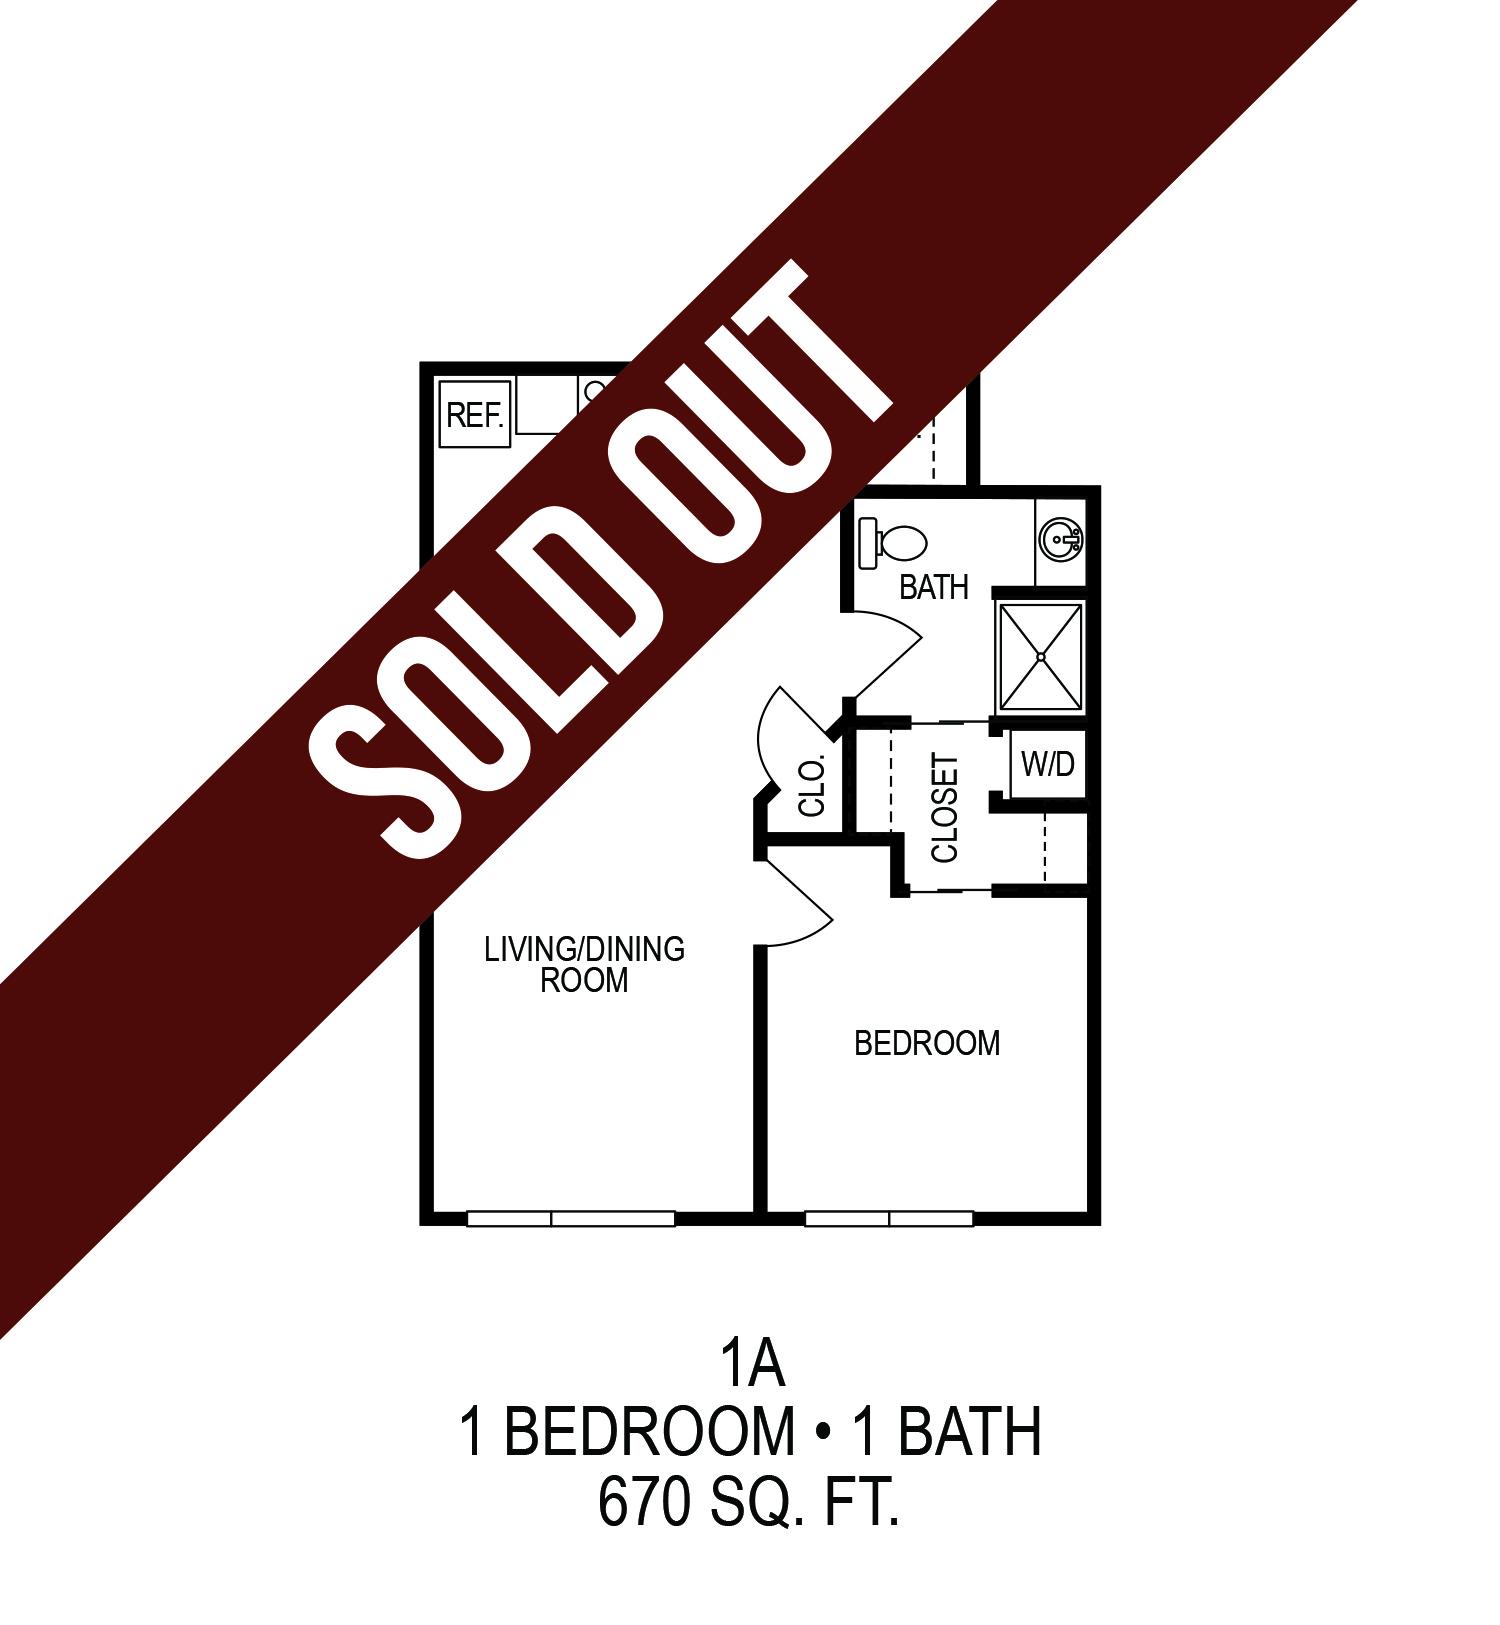 625 S. Goodman Apartments - Floorplan - One Bedroom (A)*